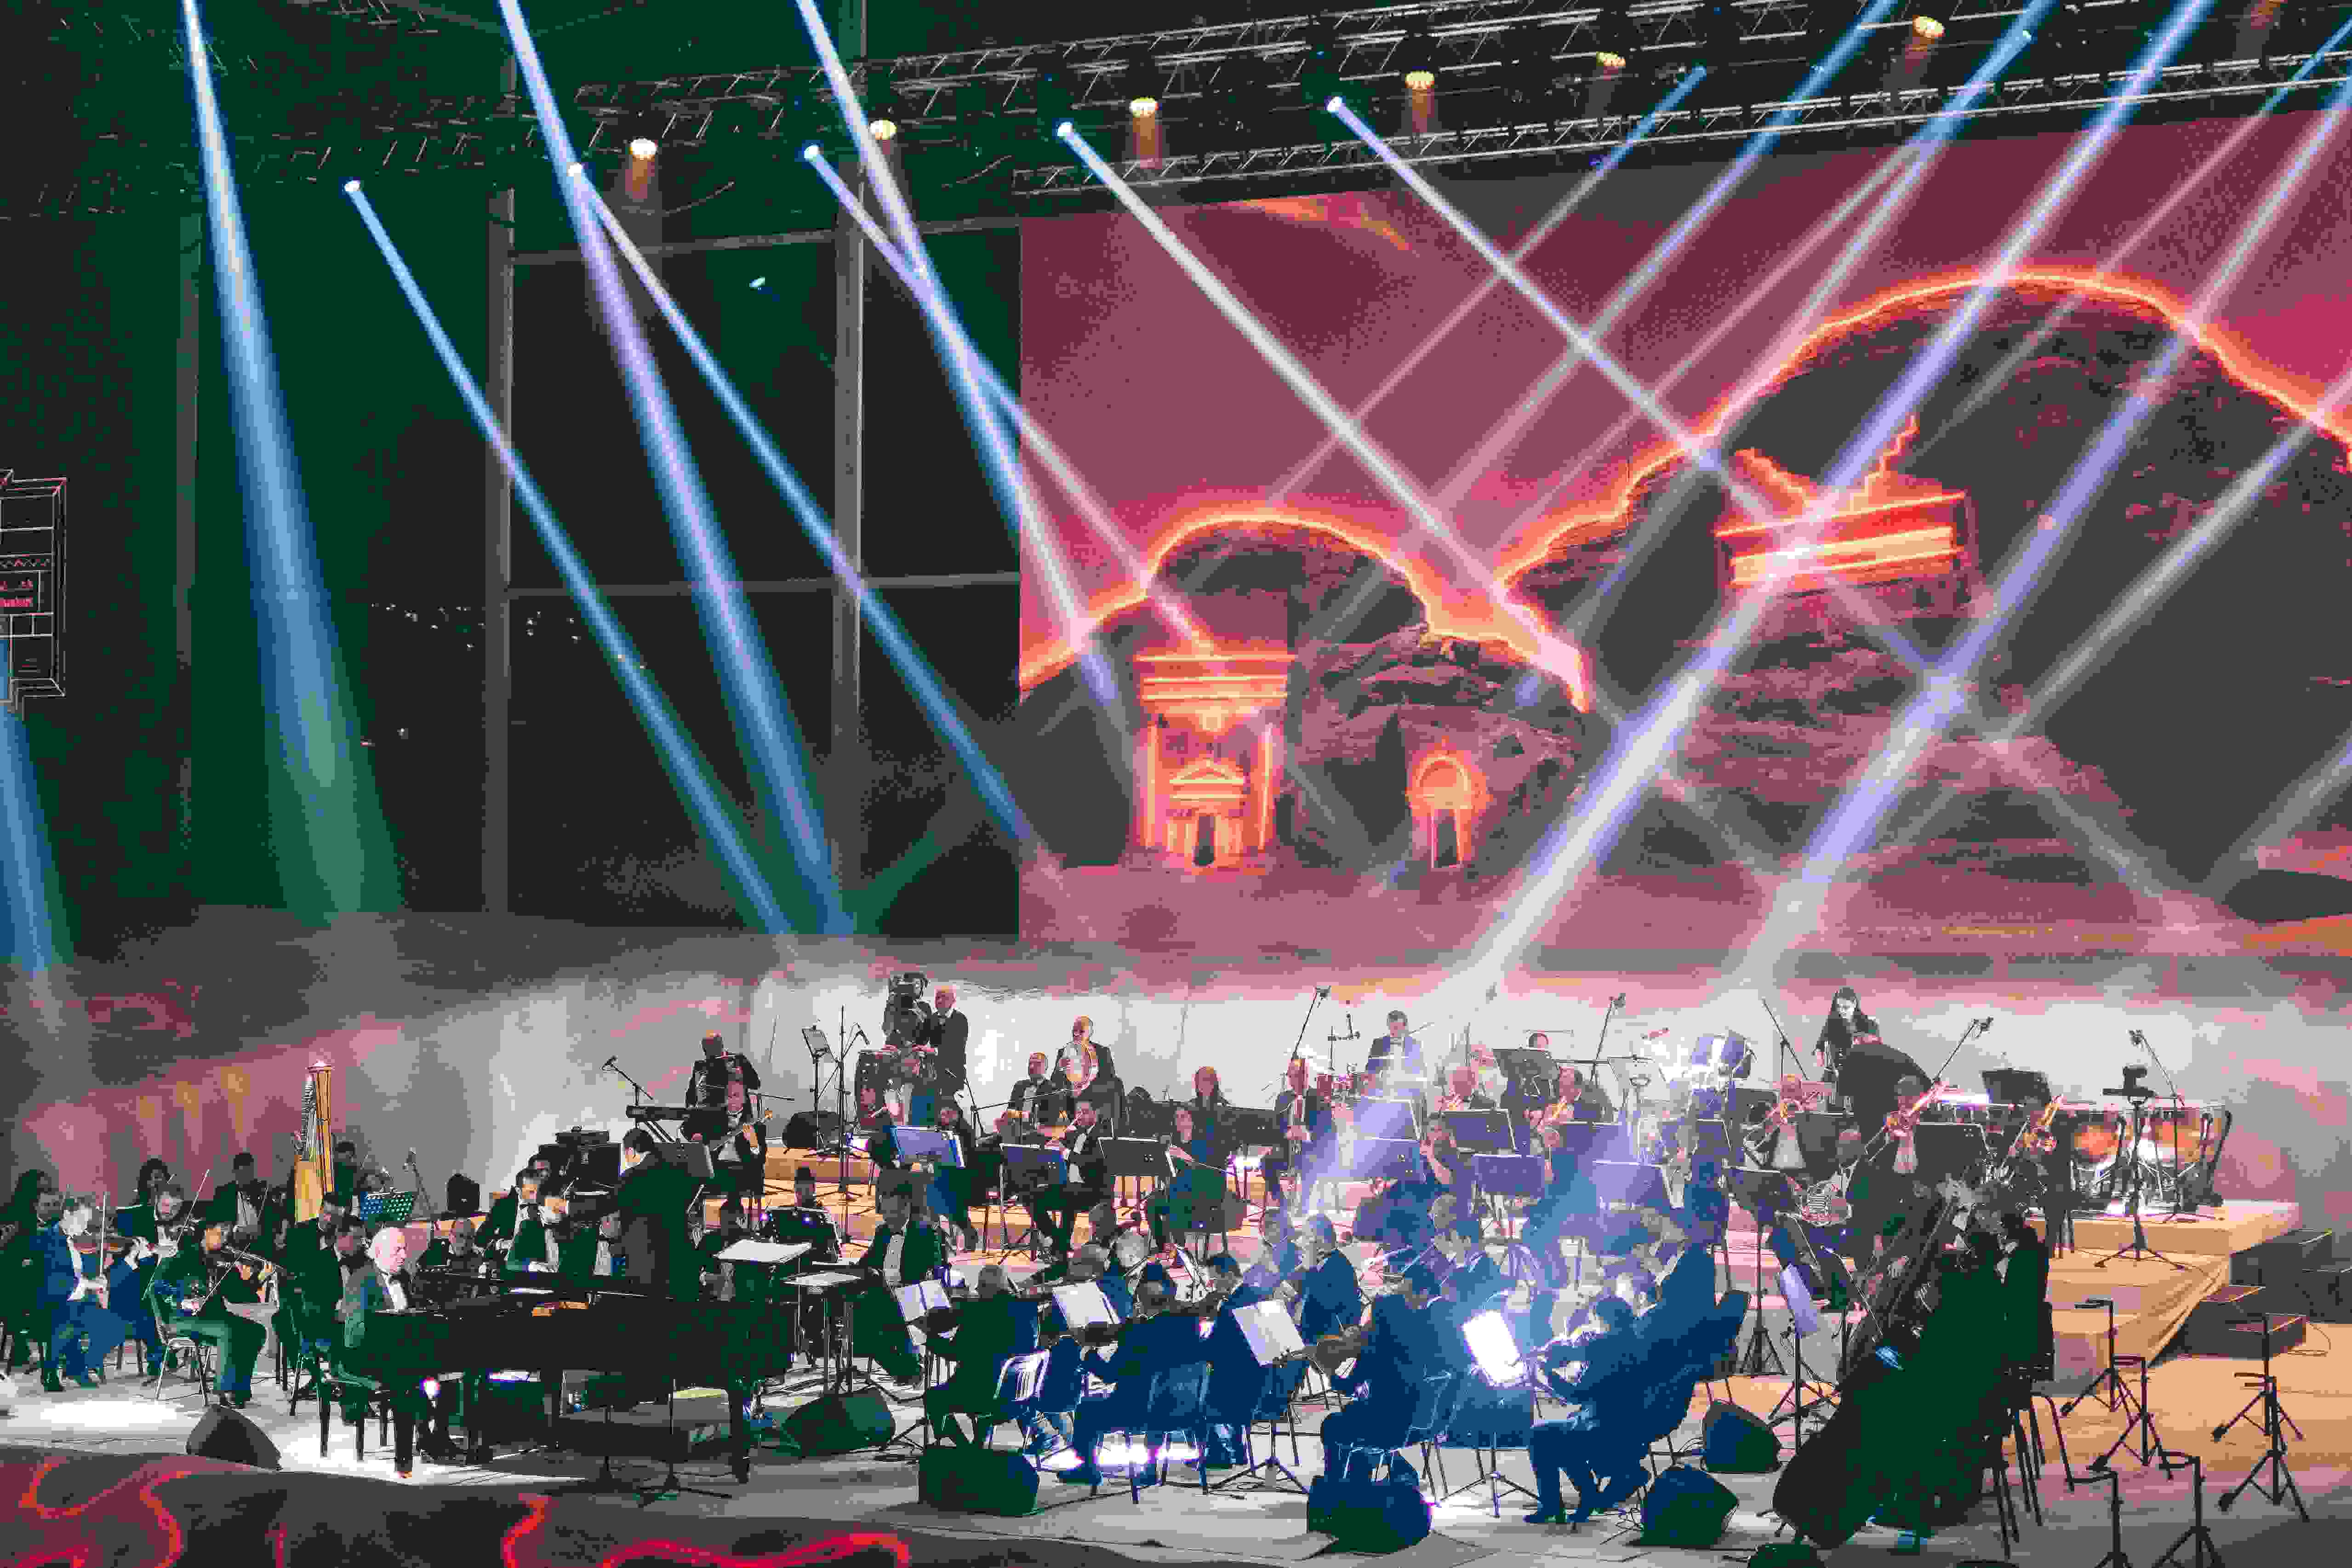 Omar Khayrat's concert in Al-Ula © Marc Nouss